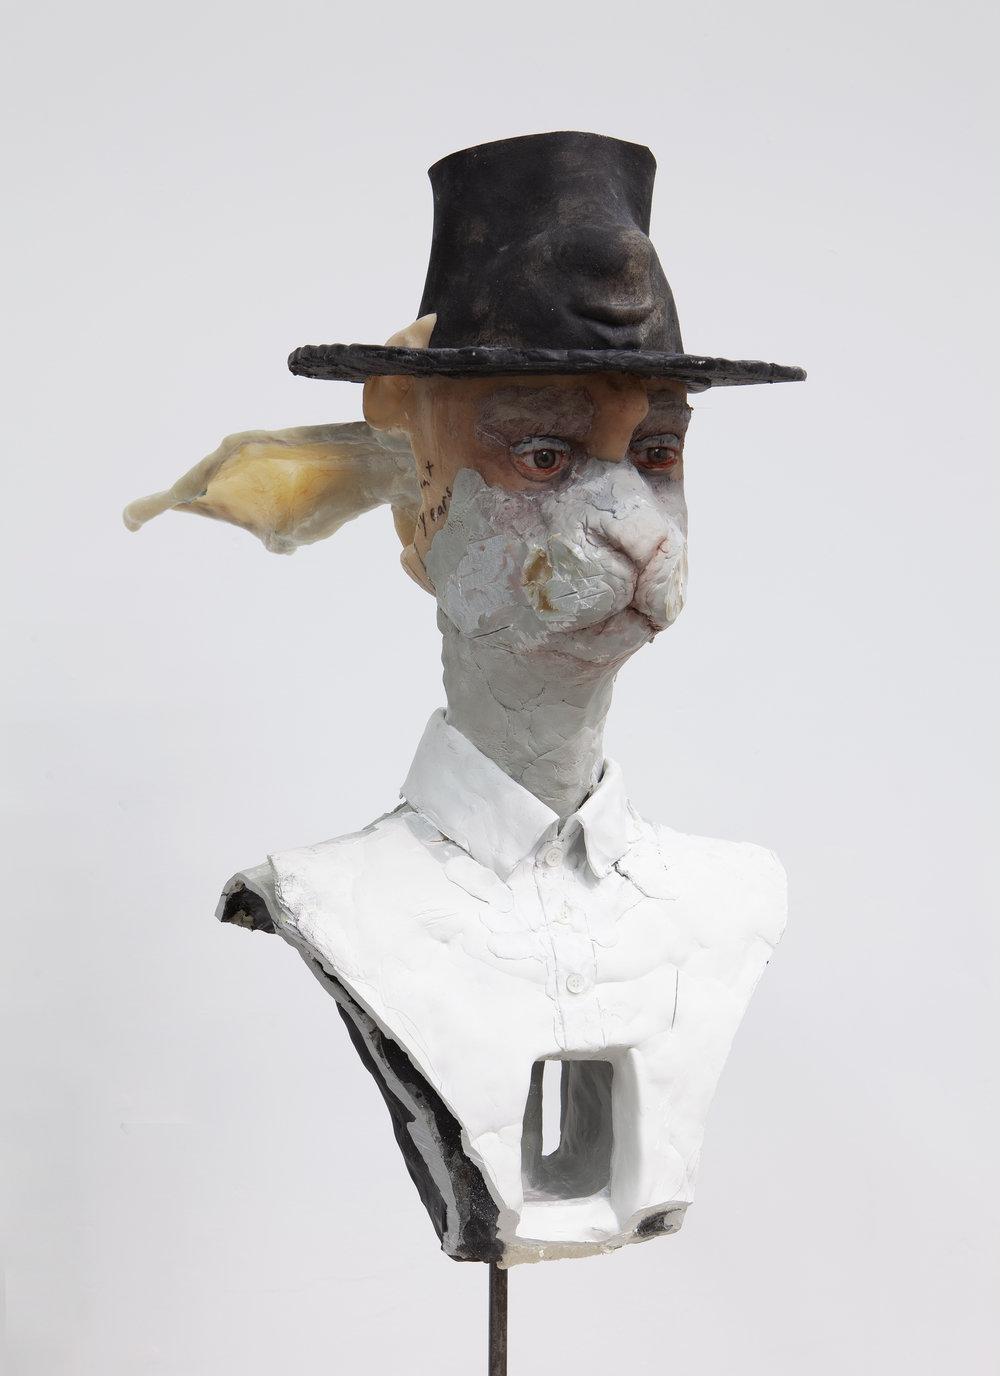 David Altmejd   Untitled , 2019 Expanded polyurethane foam, epoxy clay, resin, epoxy gel, cardboard, glass eyes, quartz, acrylic paint, steel, cement, Sharpie 32 x 14 x 20 inches 81.3 x 35.6 x 50.8 cm